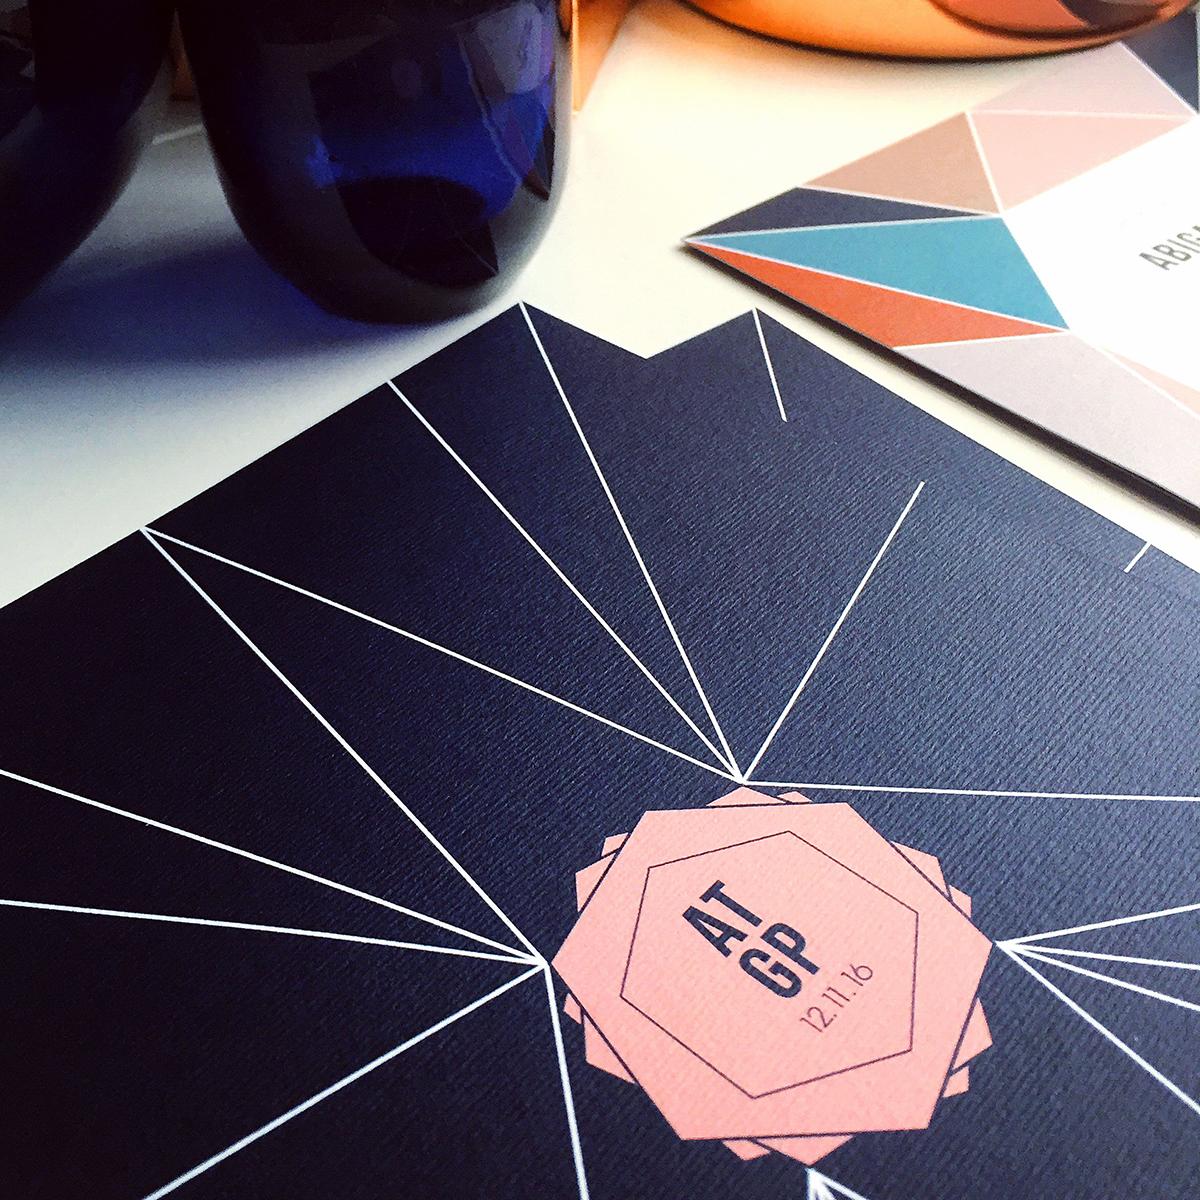 geometric-copper-invite-wedding-the-ink-closet-invitation-evening-2.jpg